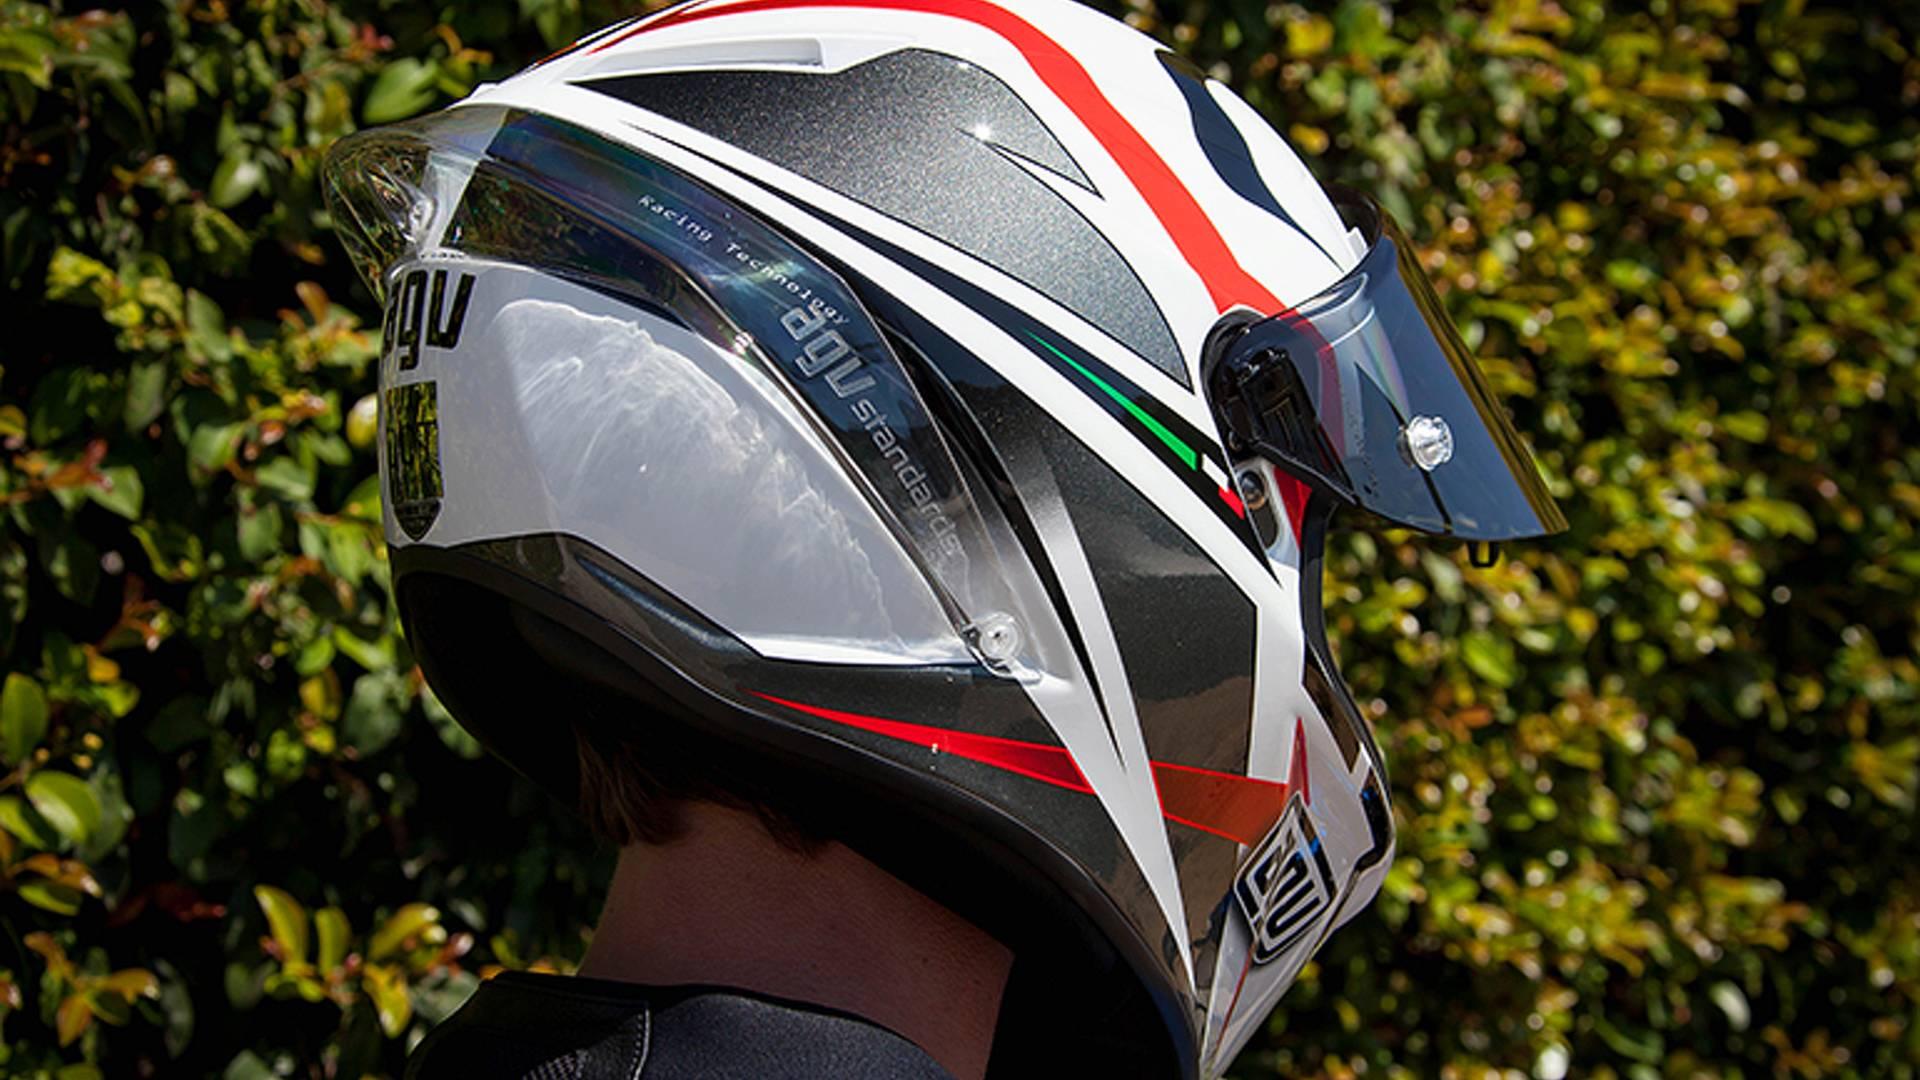 AGV Veloce S Multi Soleluna Motorcycle Helmet For Sale